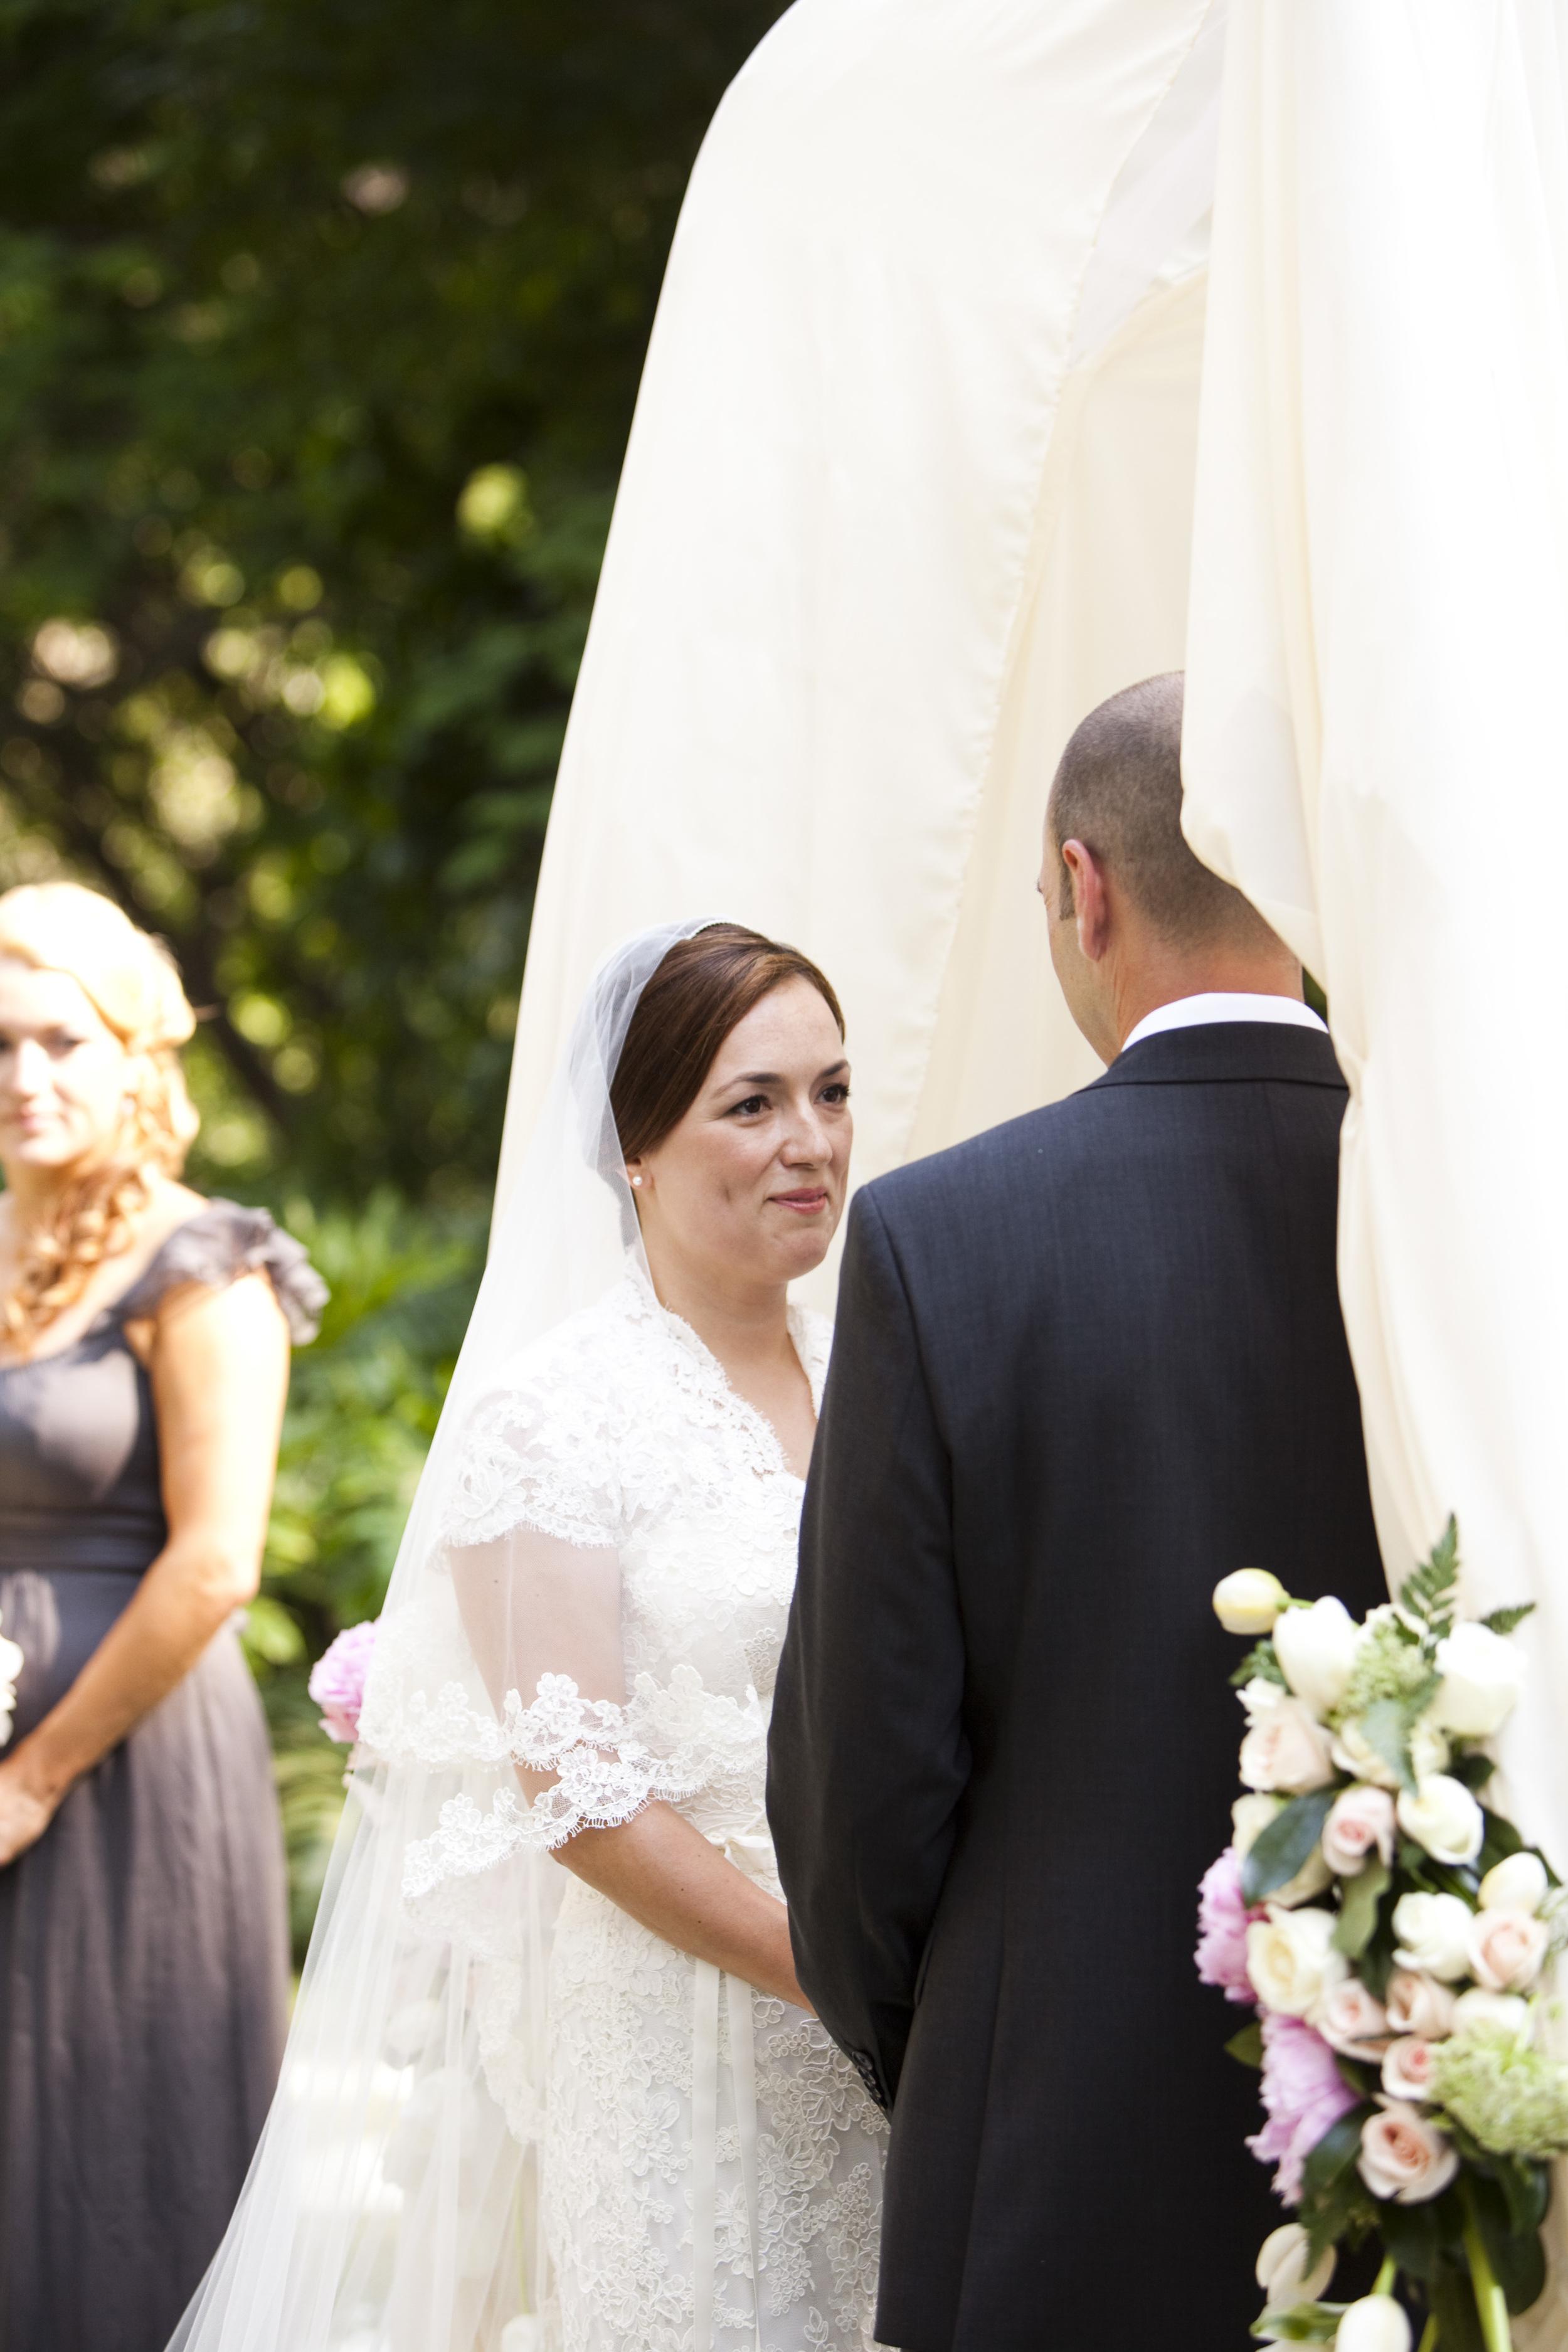 Ceci_New_York_Style_Luxury_Custom_Mexico_Wedding_CeciBride_Letterpress_NewYork_Foil_Hacienda_de_San_Antonio_18.jpg